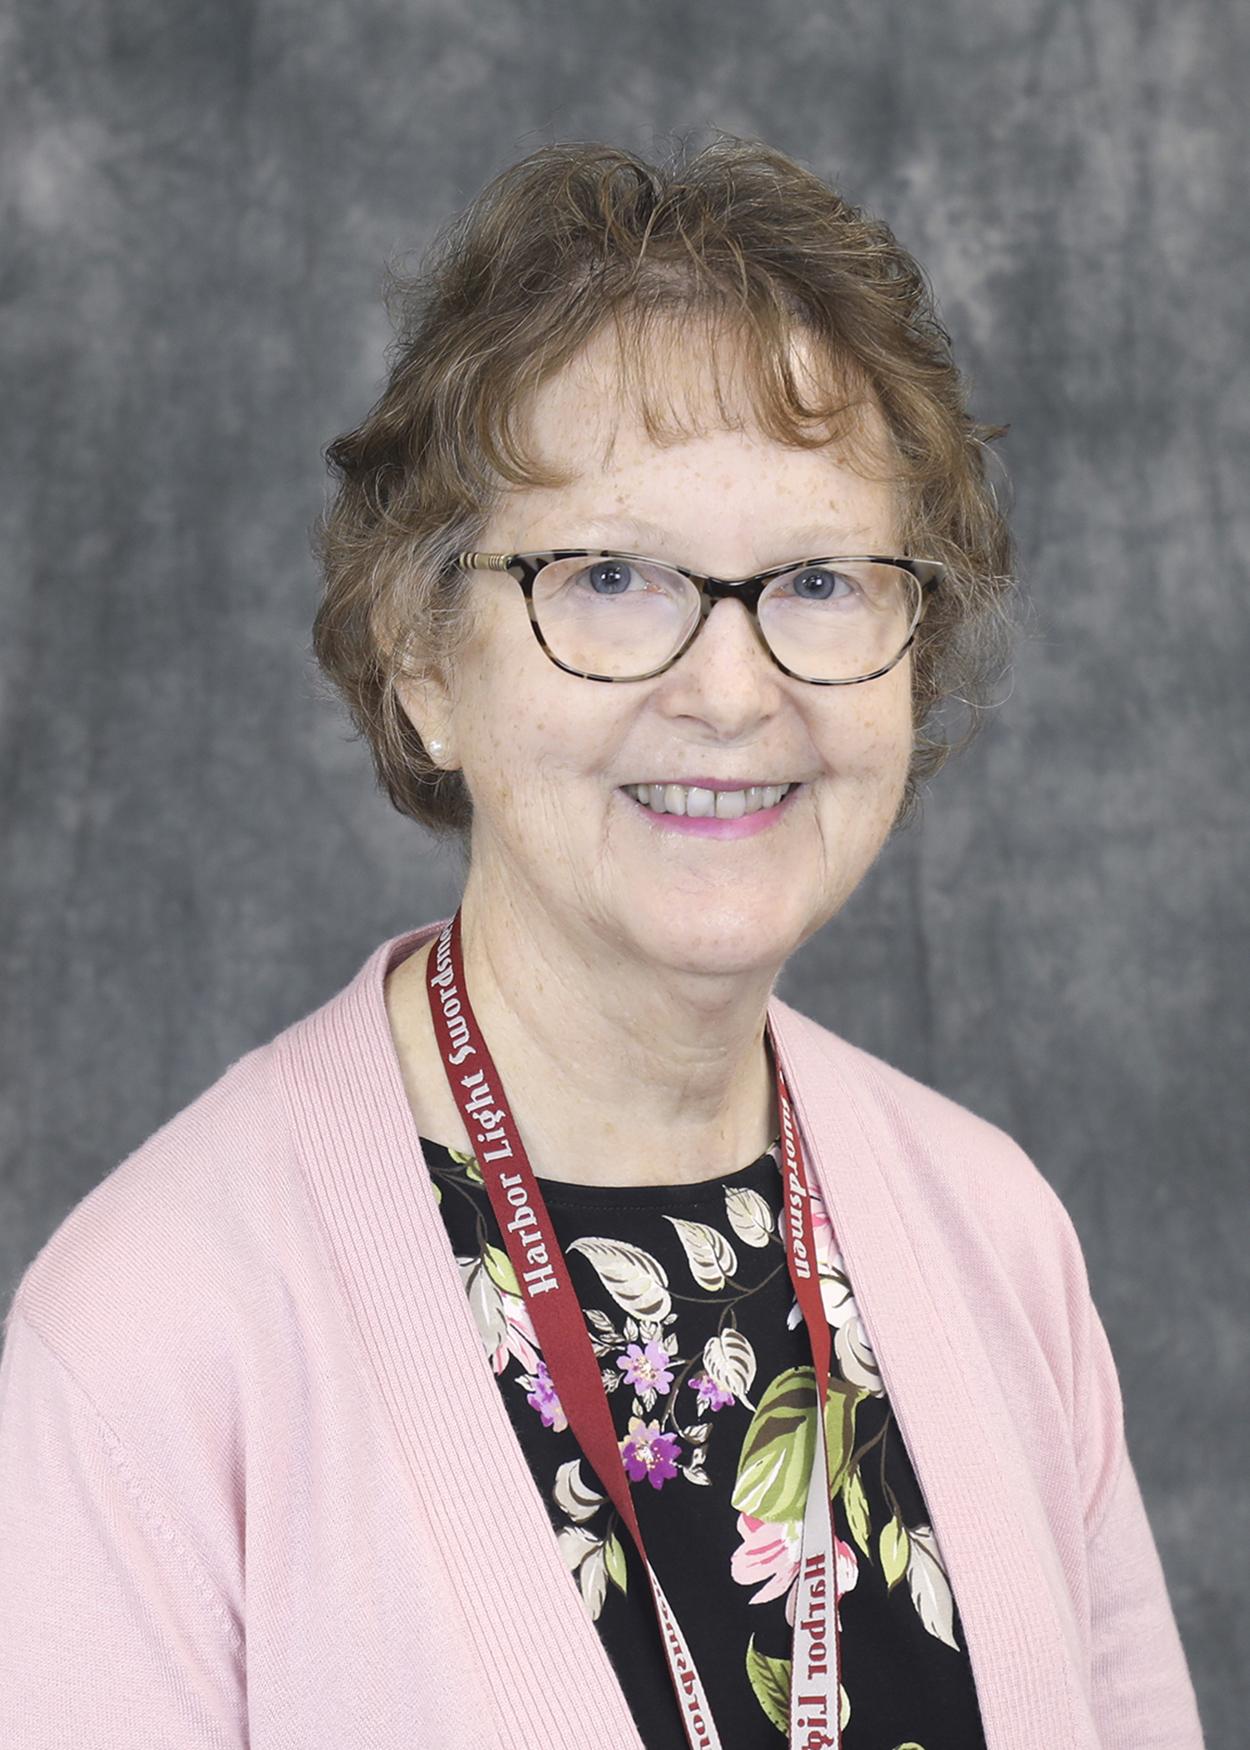 Ledingham Debbie